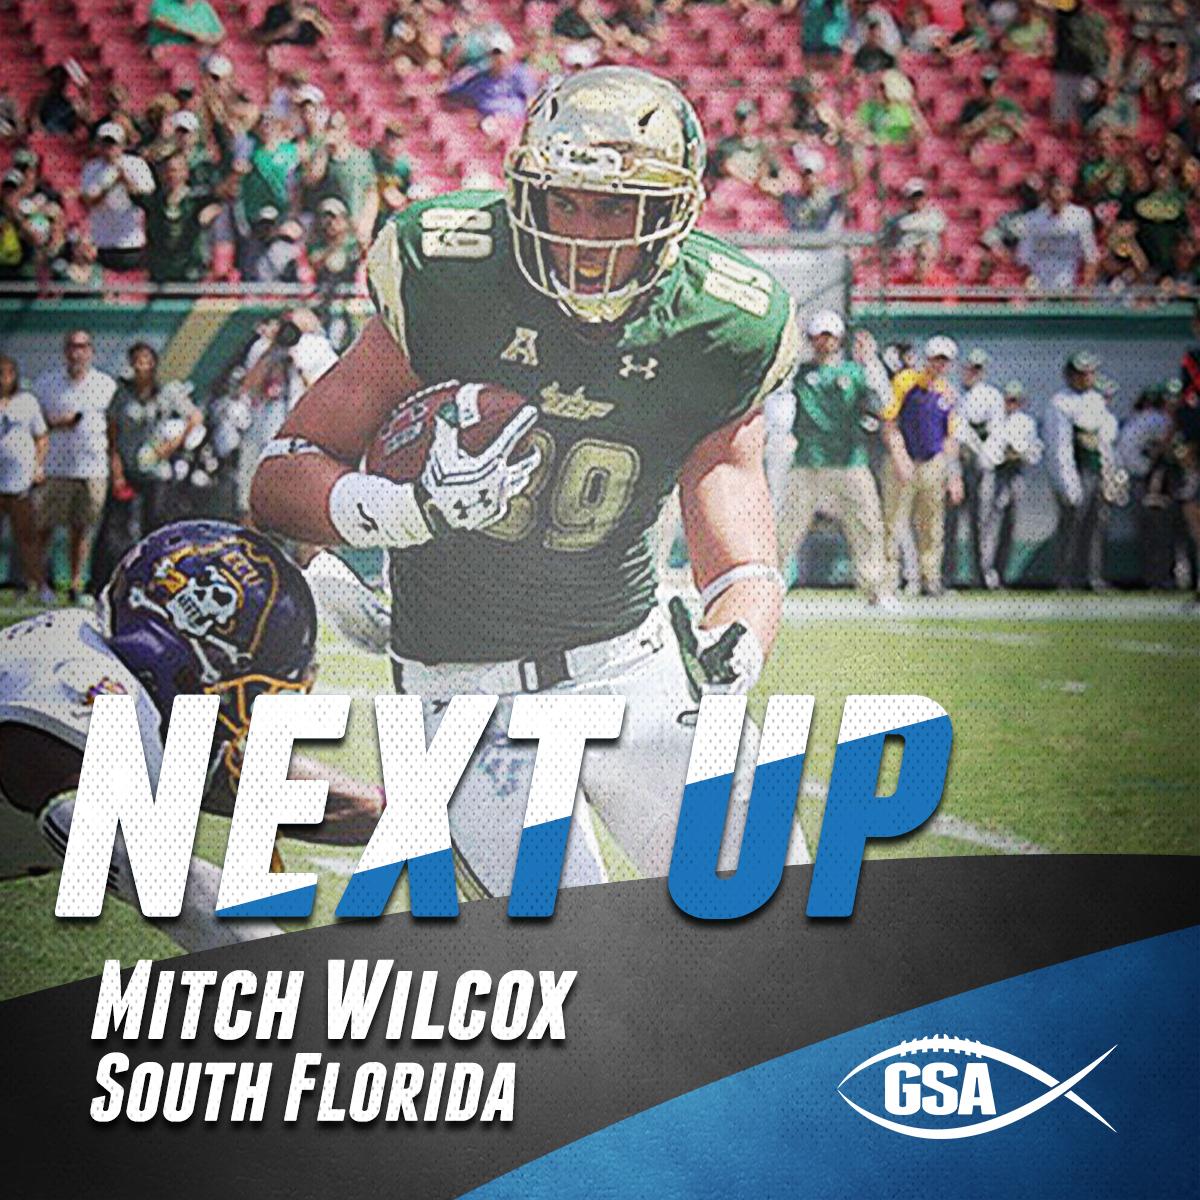 Next Up - Wilcox.jpg